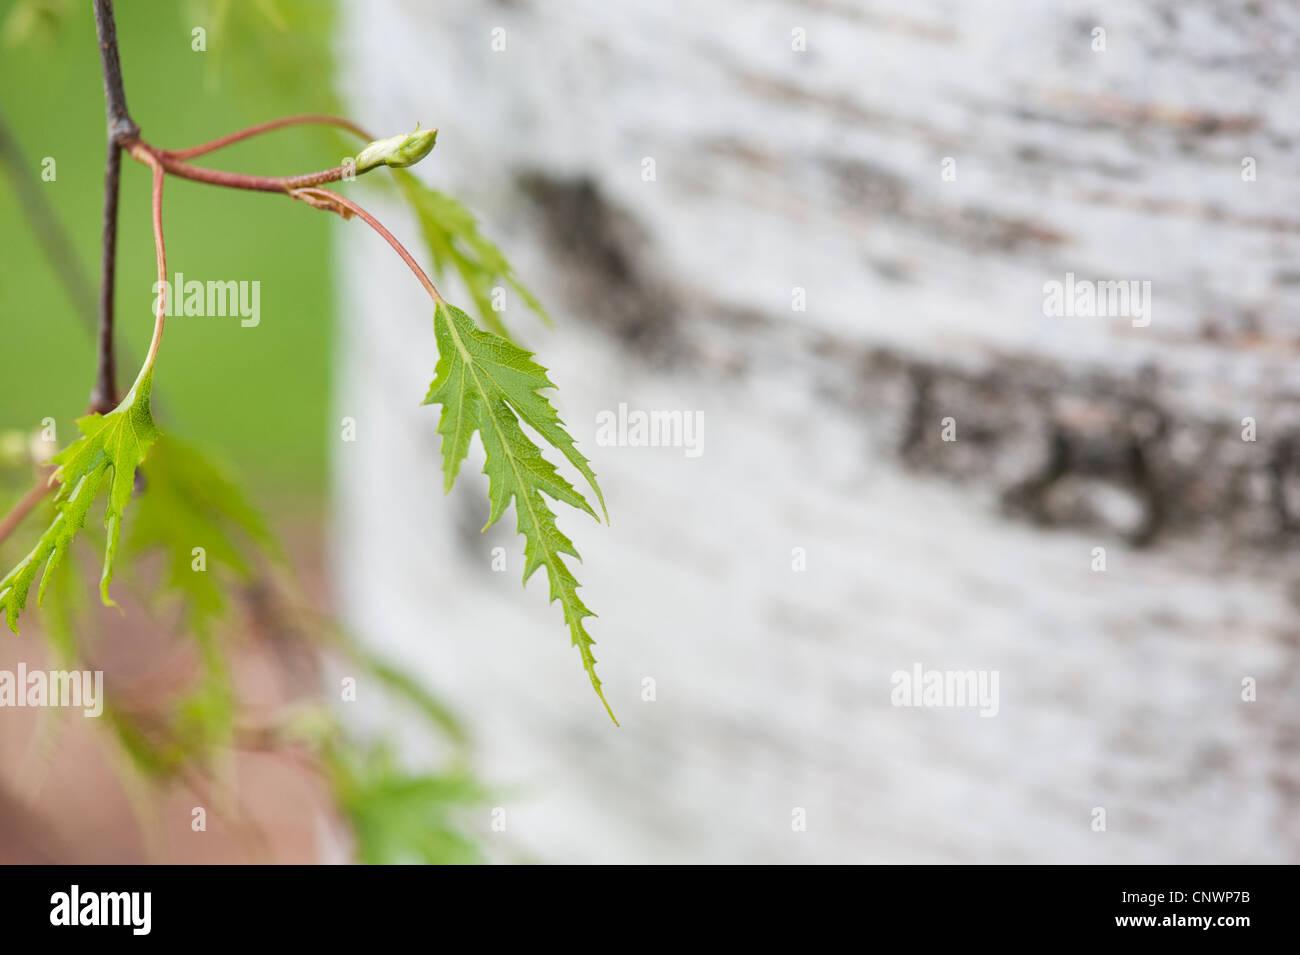 Betula pendula dalecarlica. Bouleau feuilles coupées suédois Photo Stock